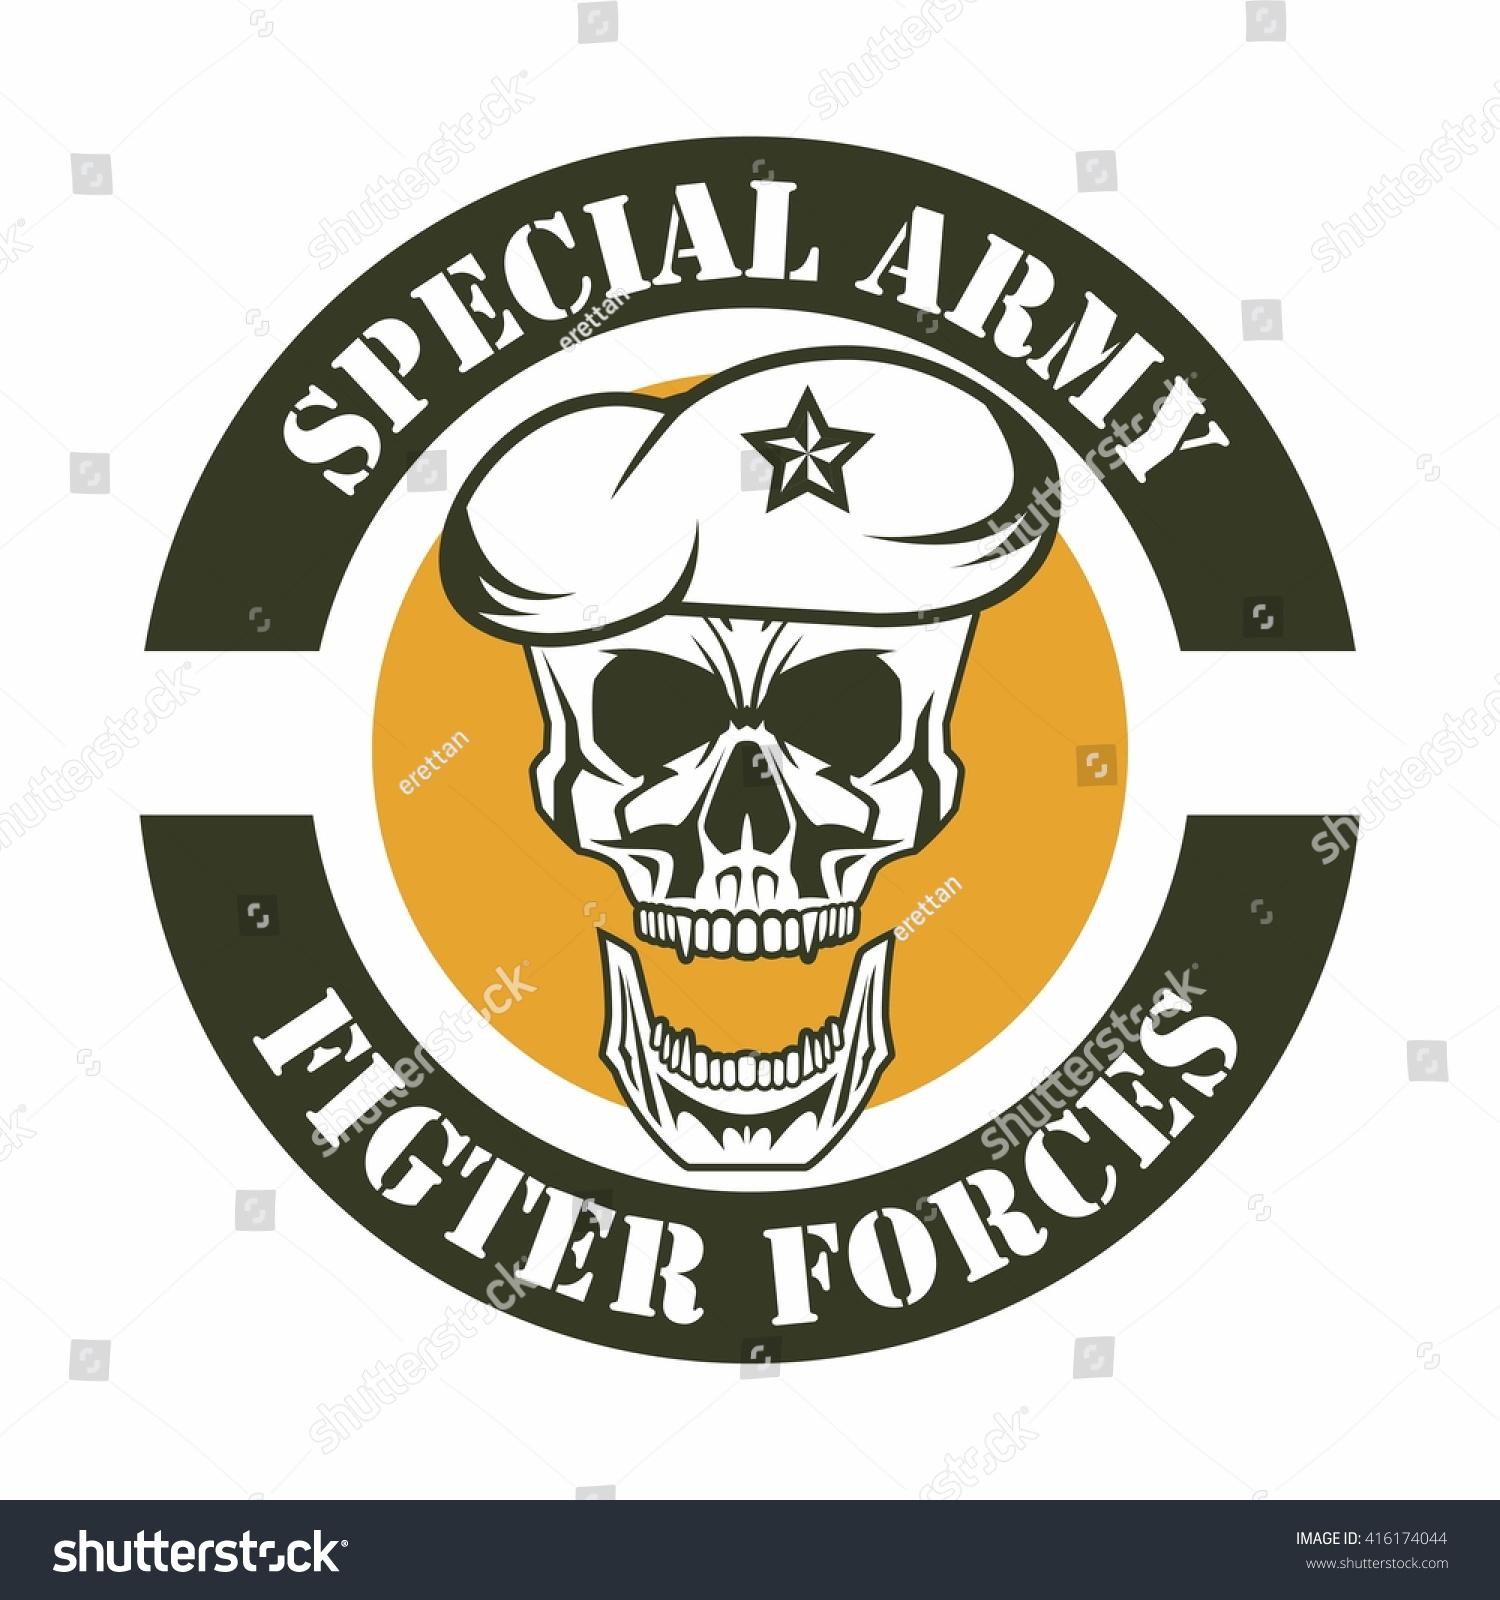 army logo template stock vector 416174044 shutterstock. Black Bedroom Furniture Sets. Home Design Ideas